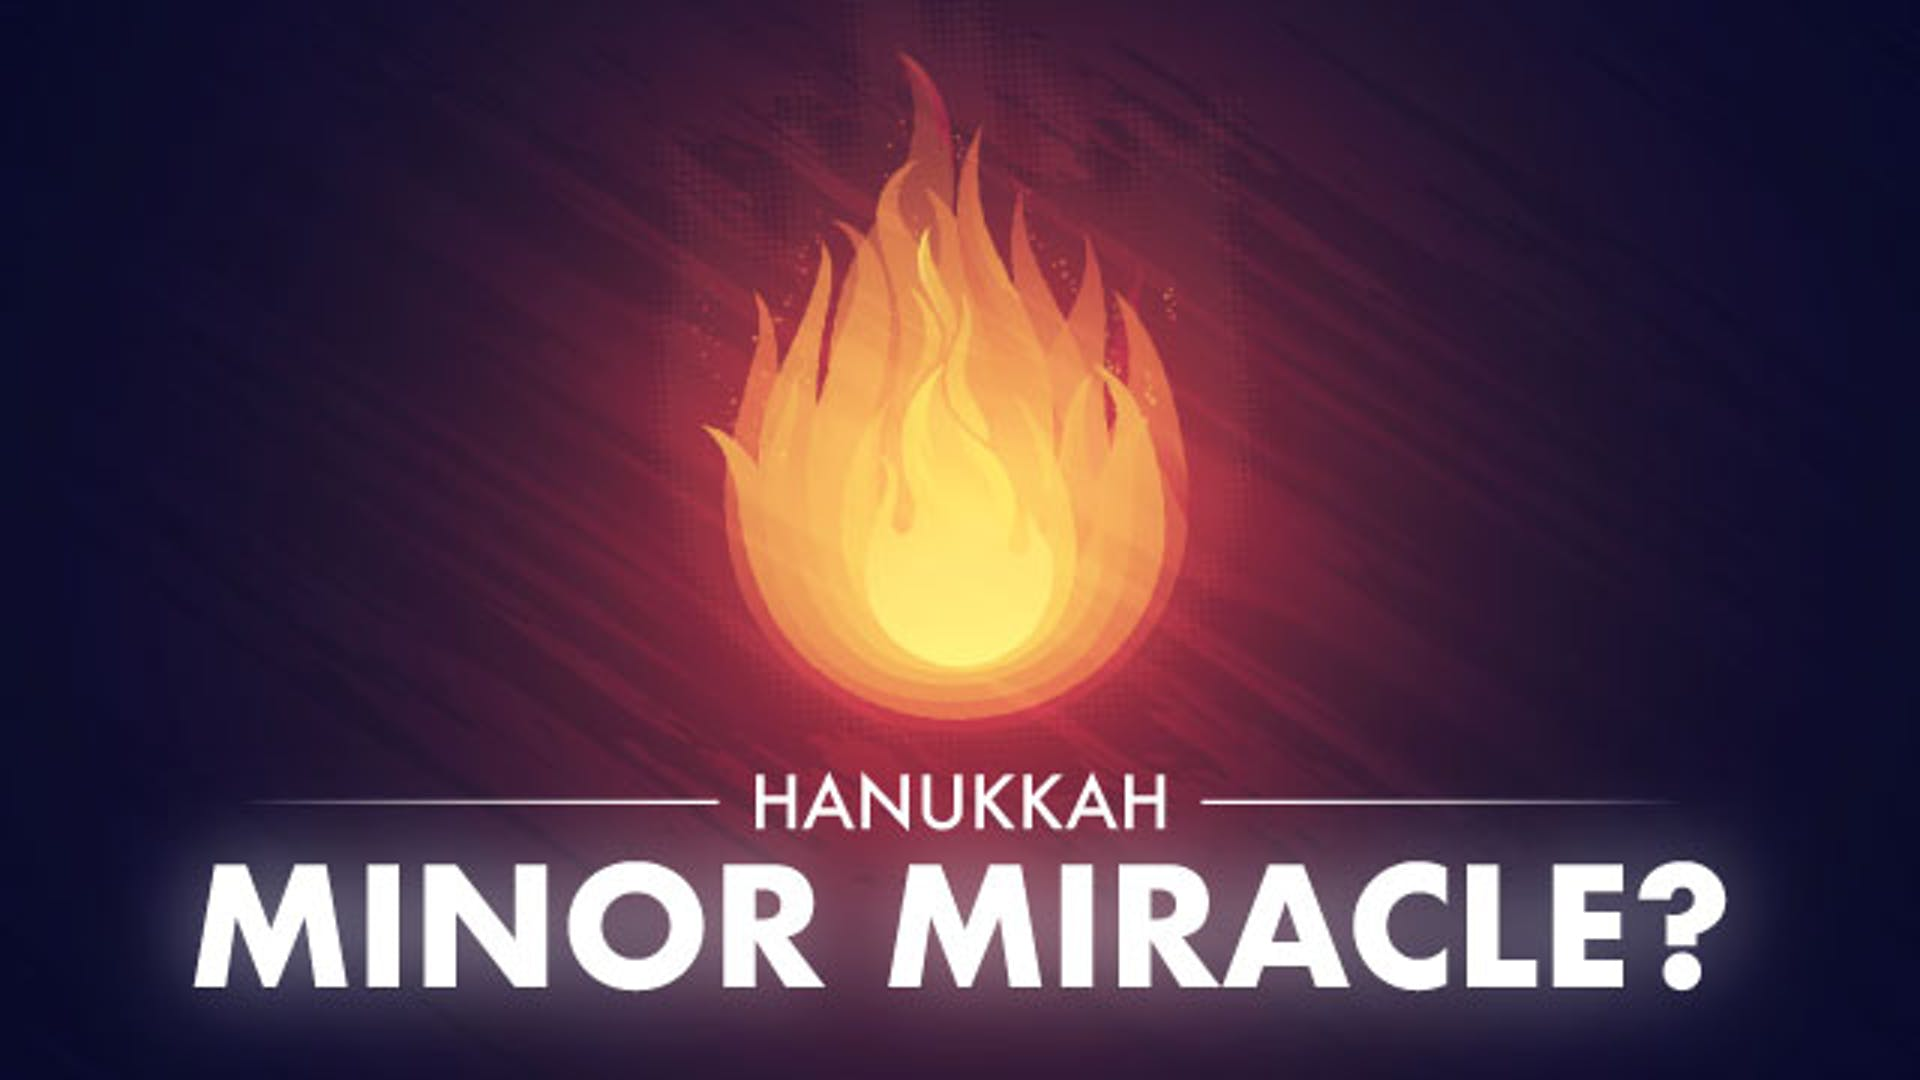 Hanukkah miracle oil light in Bible